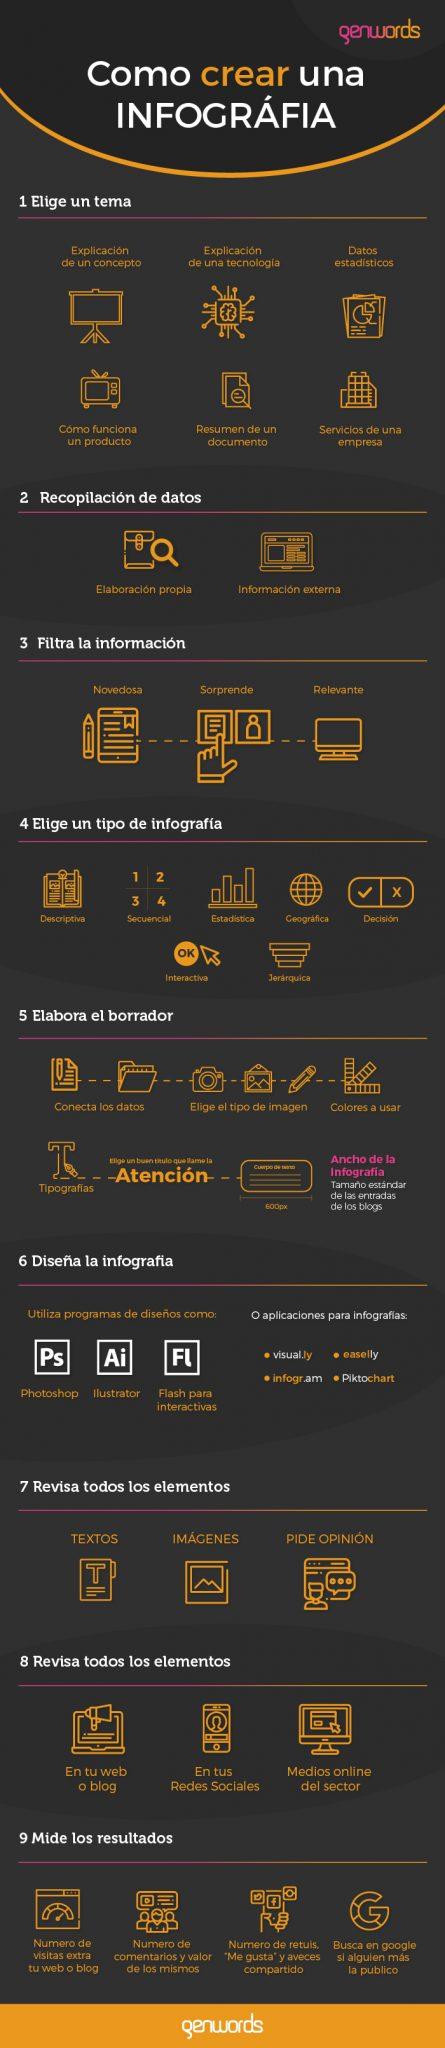 content marketing infografía